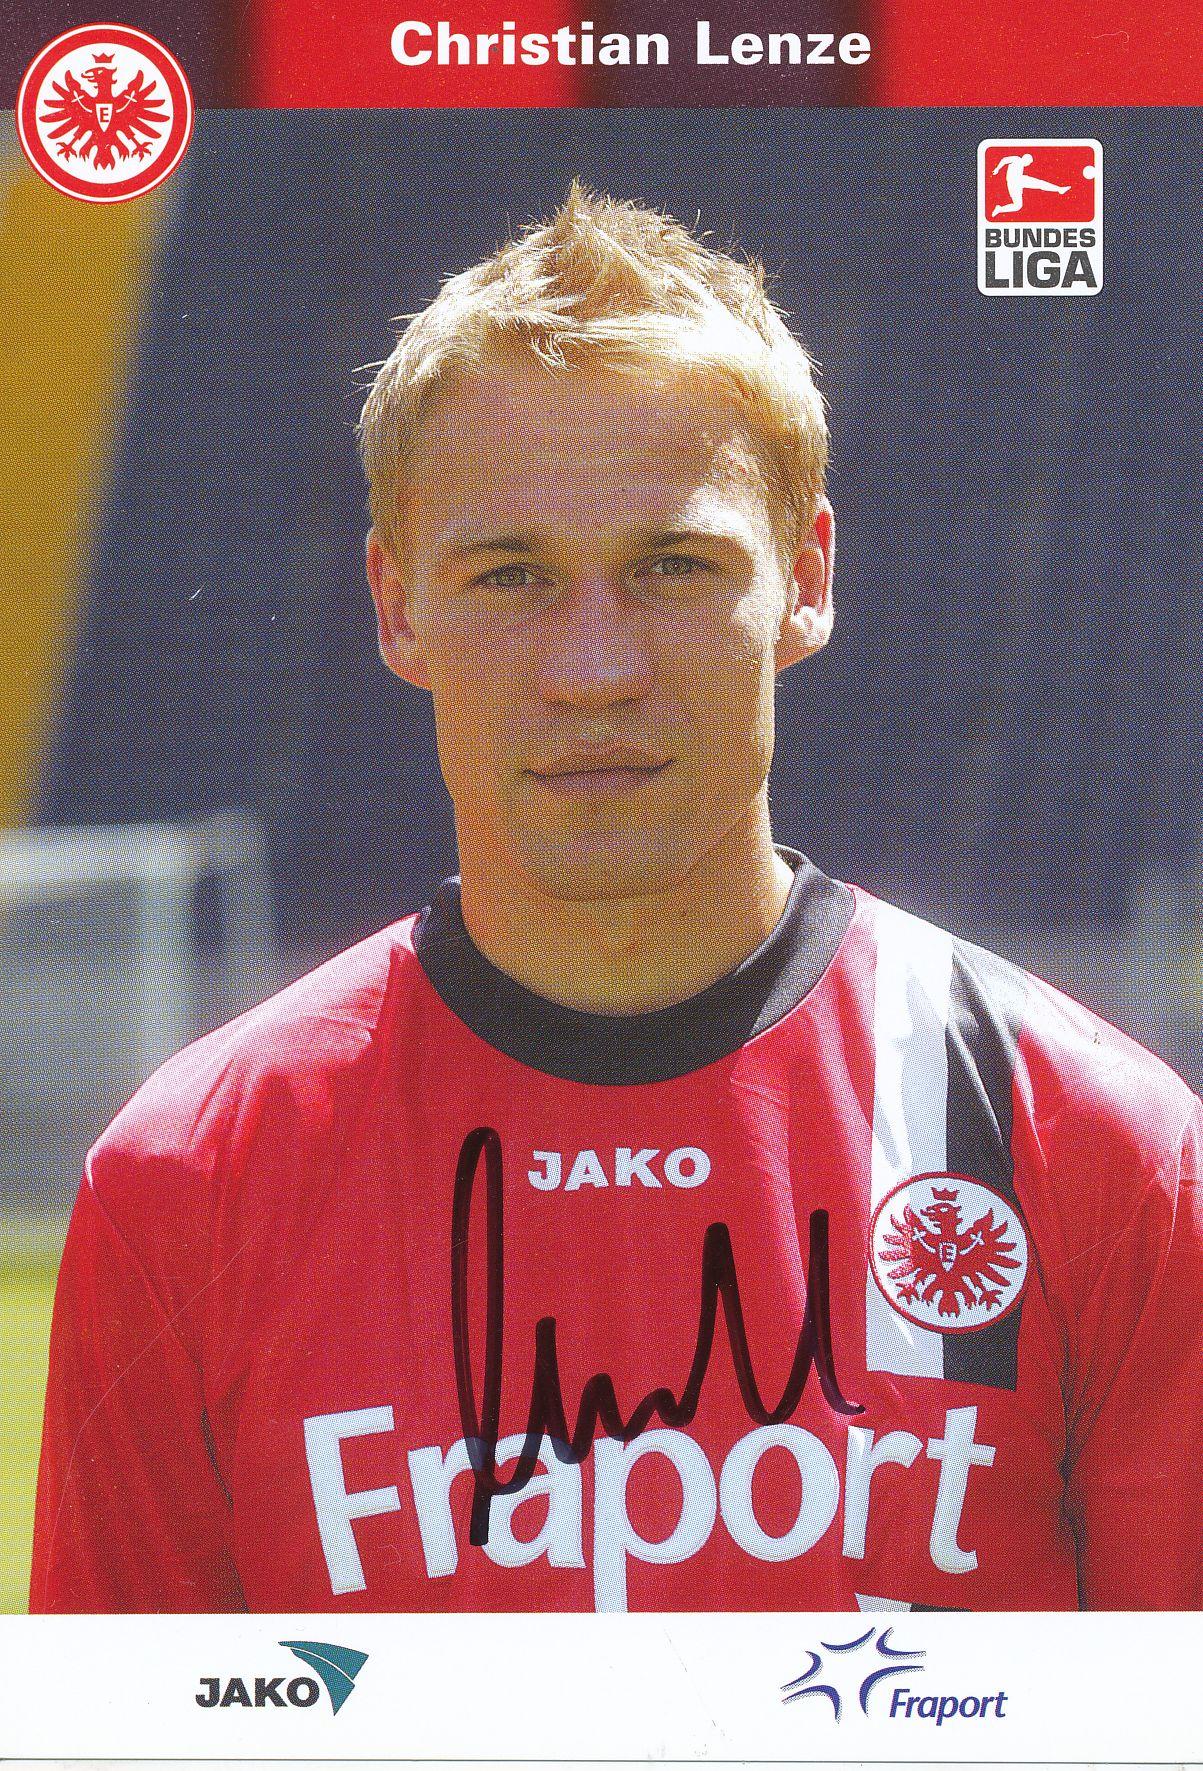 Christian Lenze